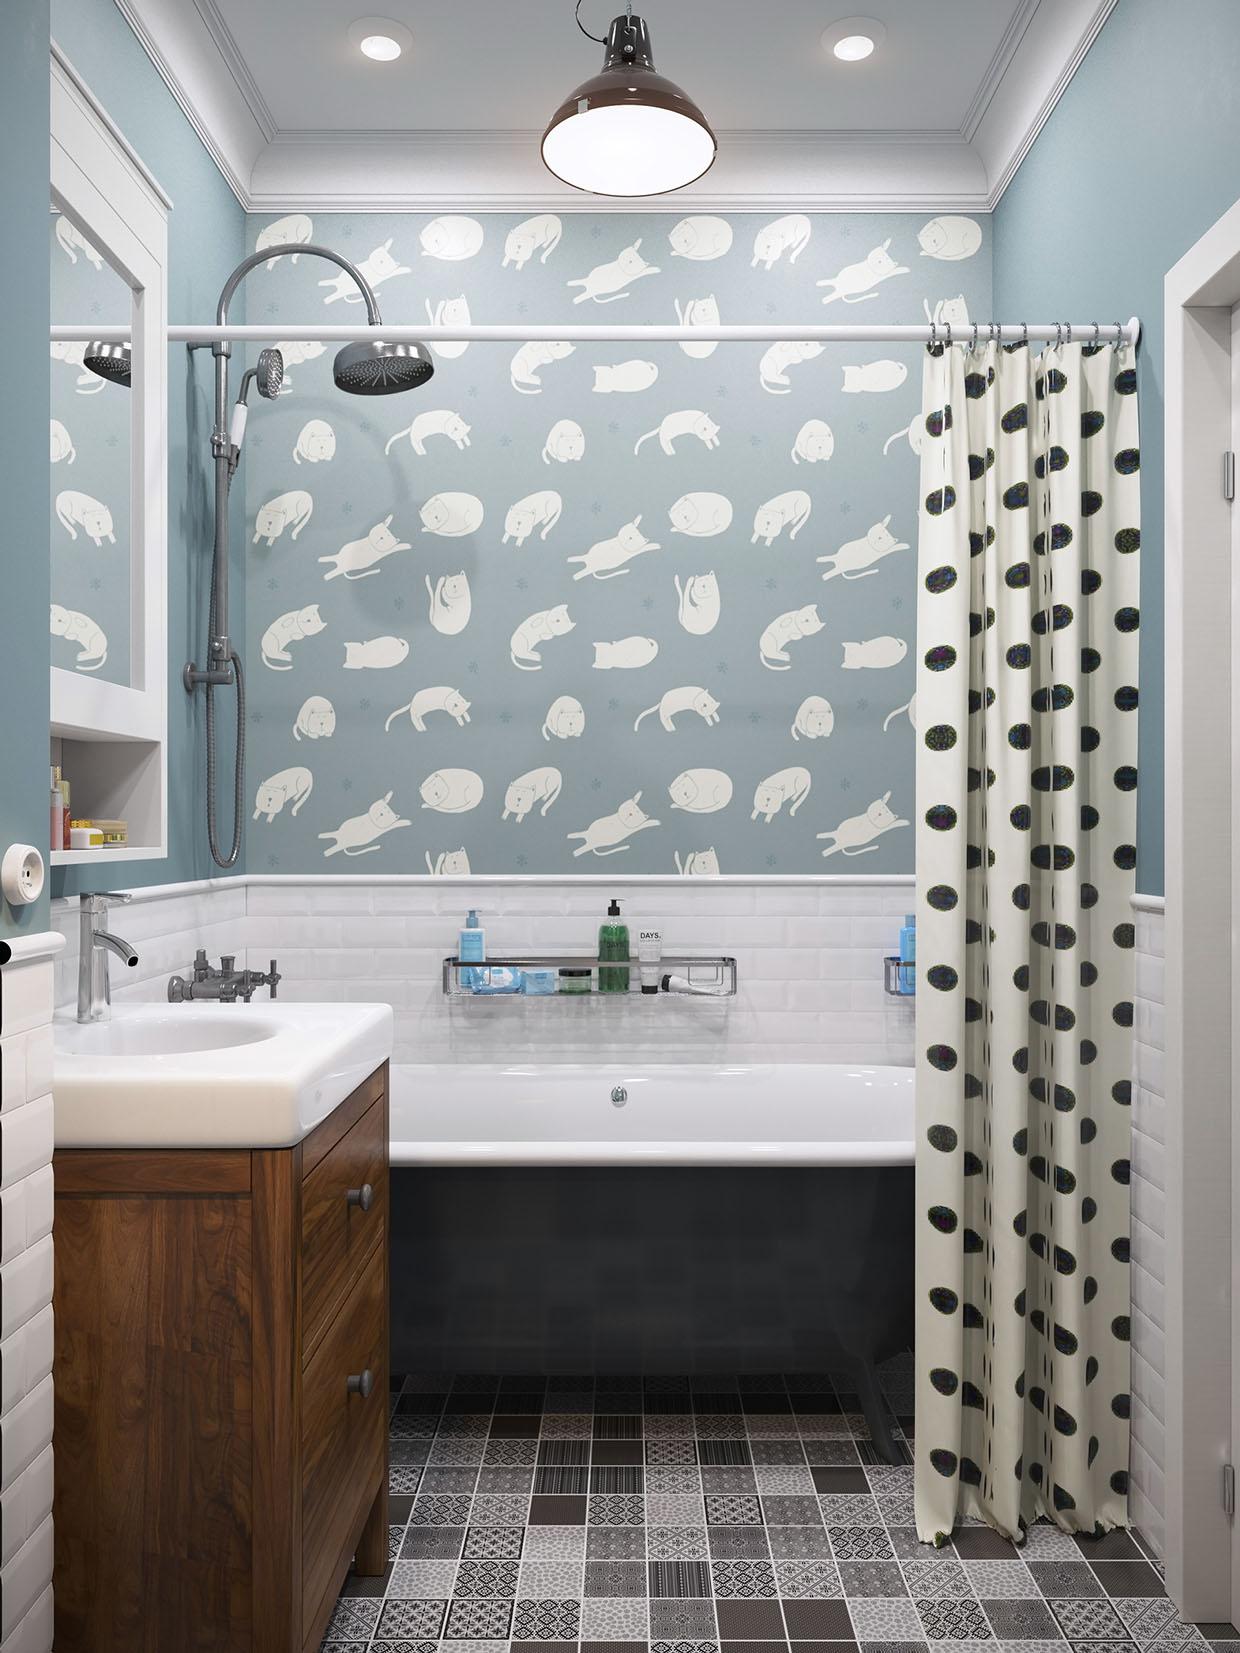 Покраска ванной комнаты своими руками фото 15